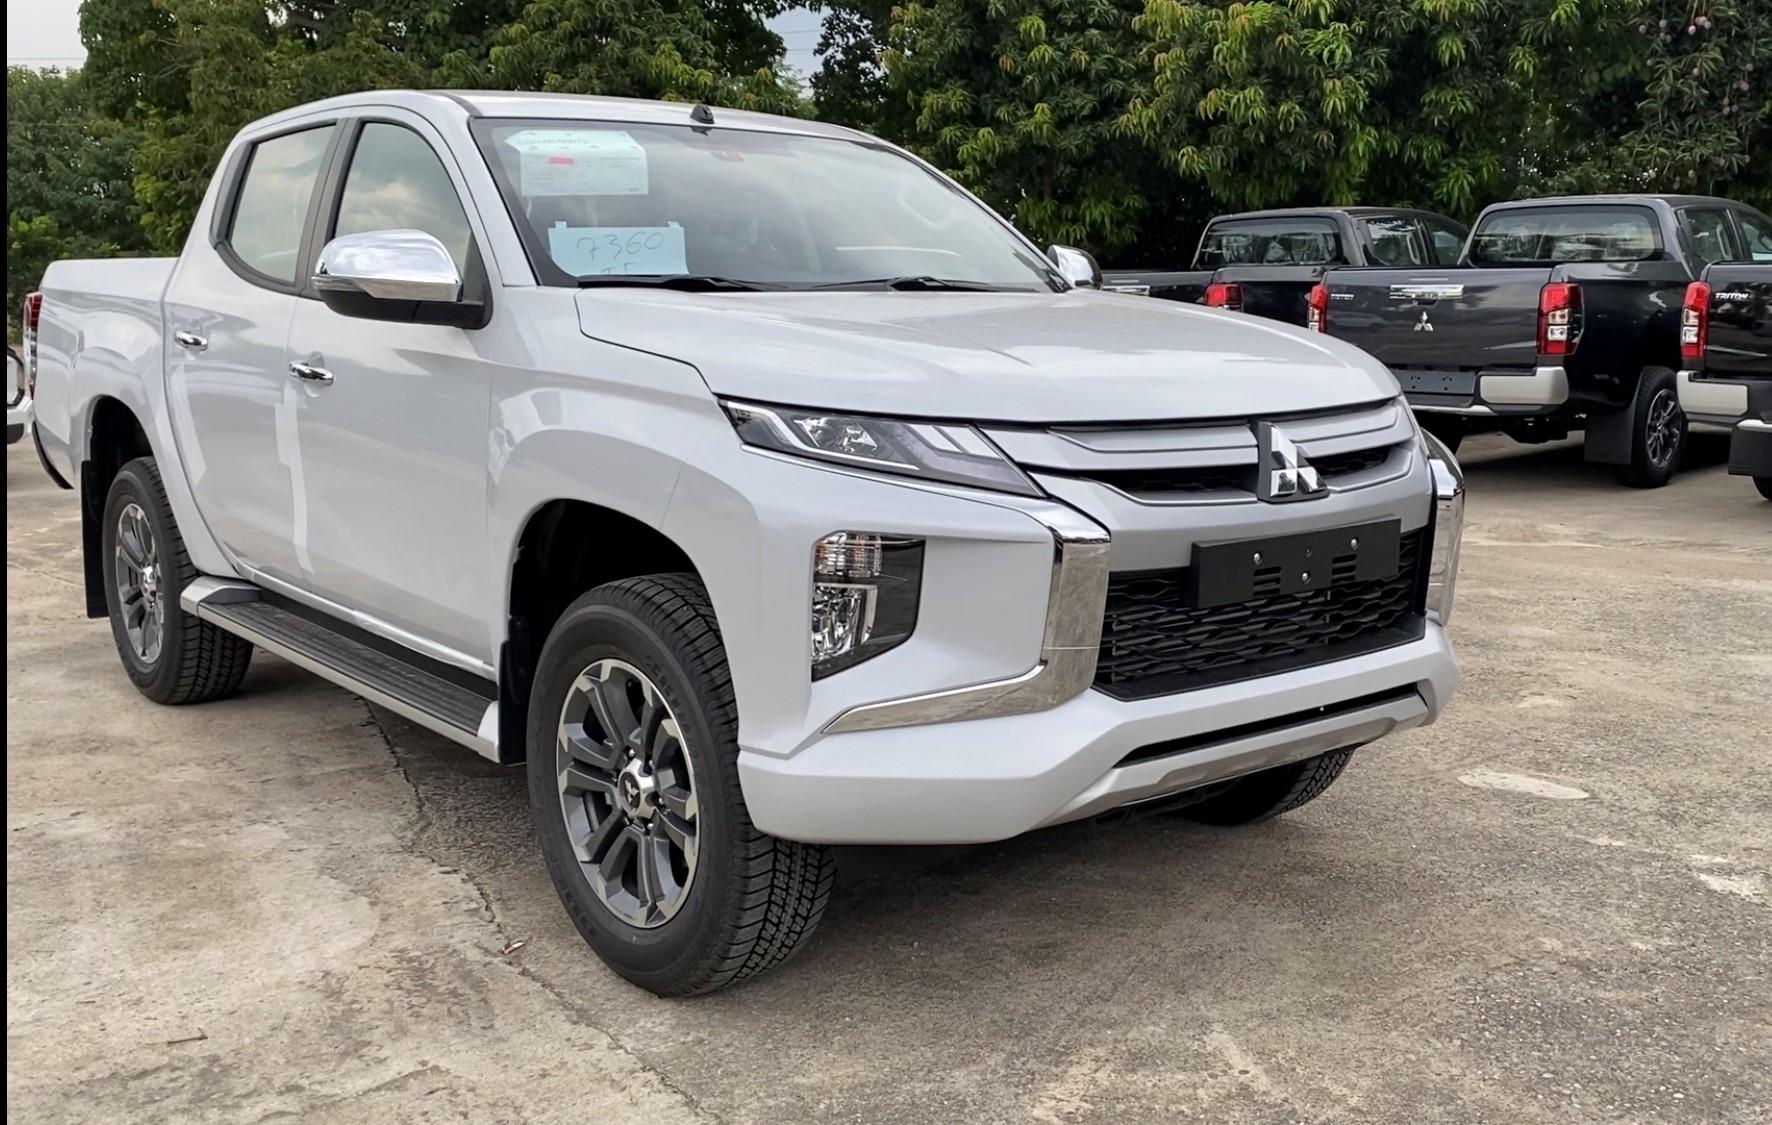 Xe bán tải Mitsubishi Triton 2022